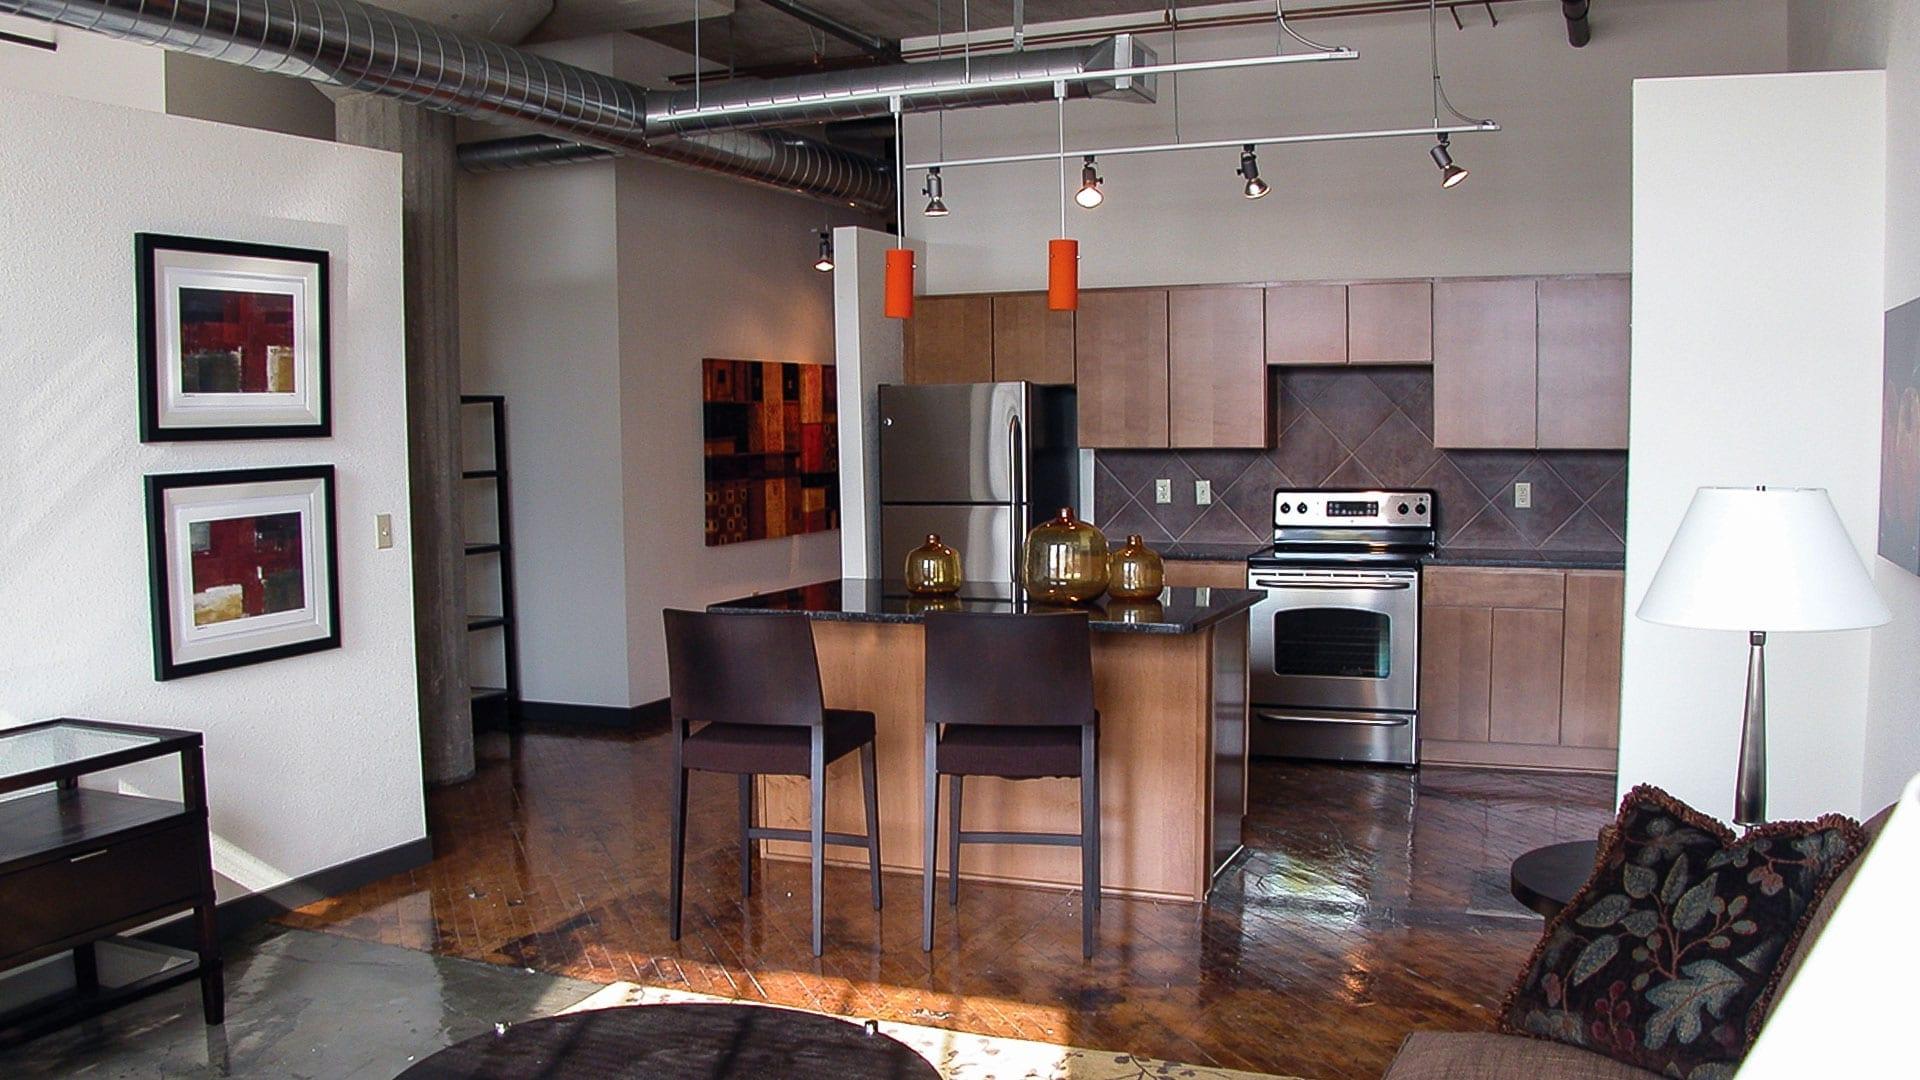 Freight House Lofts  Kansas City Lofts  Apartments  KCLoftCentral